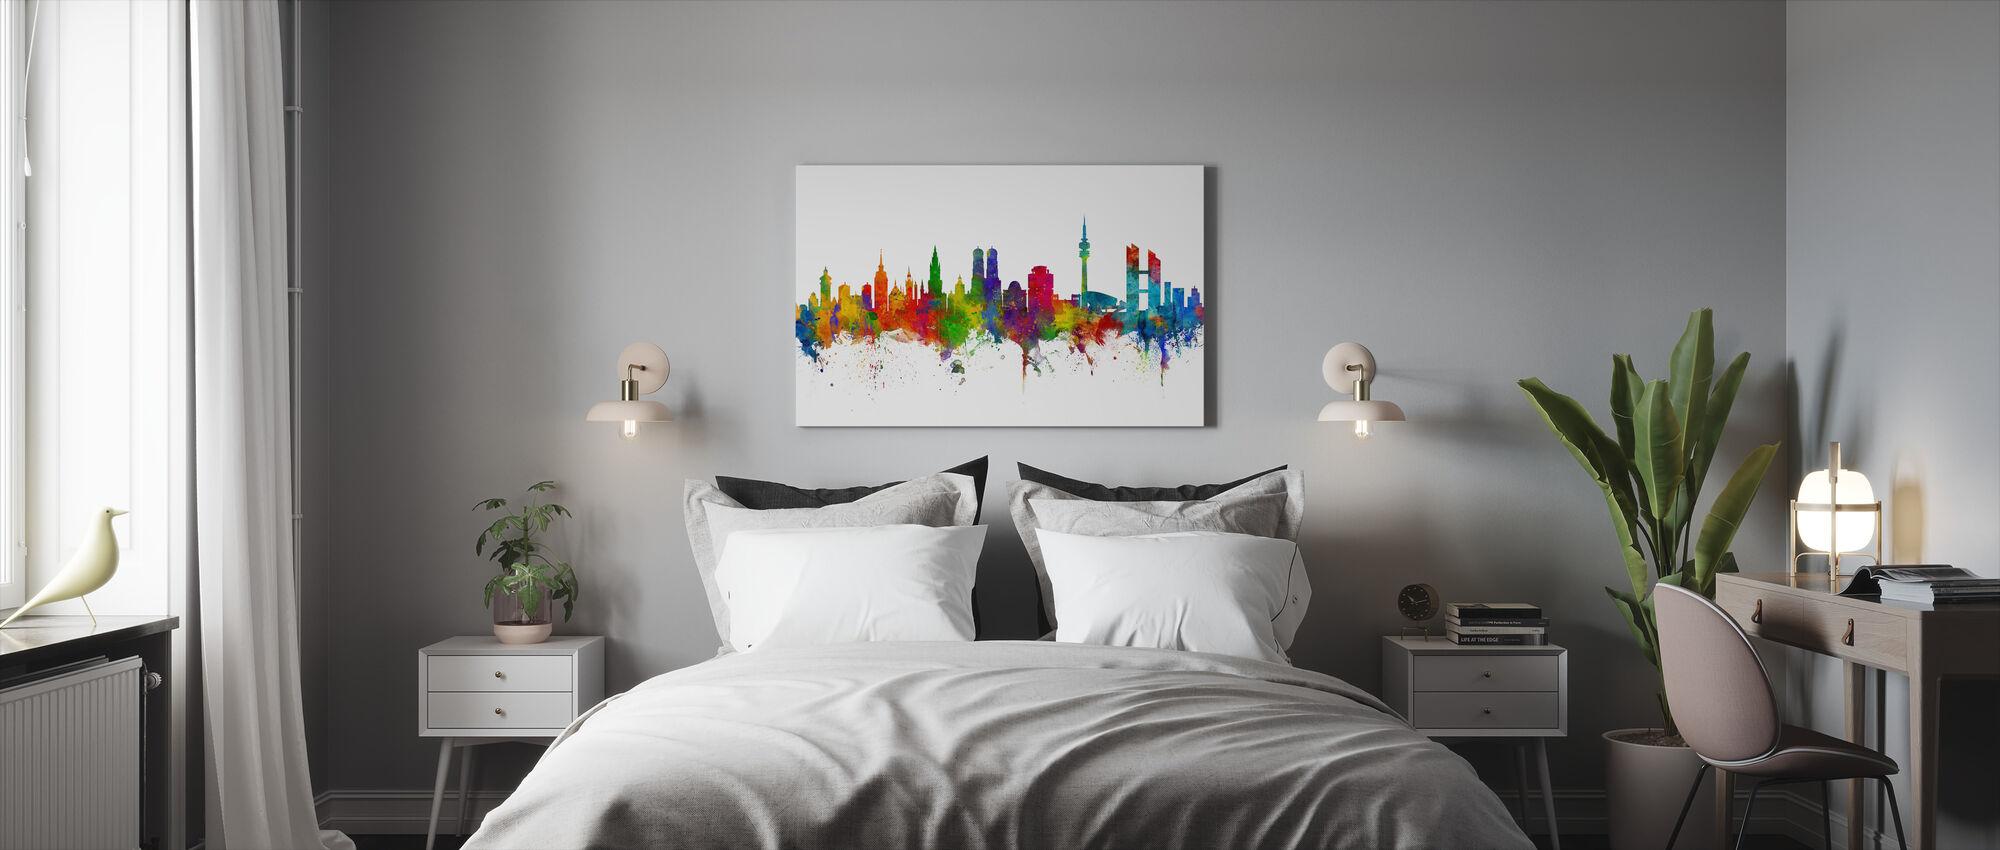 Munich Skyline - Canvas print - Bedroom